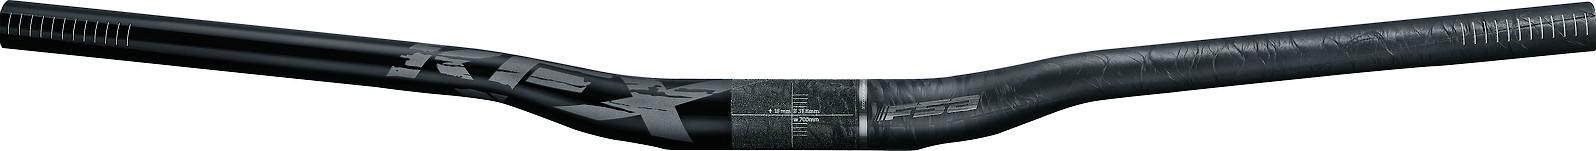 FSA KFX Carbon Handlebar (low riser)